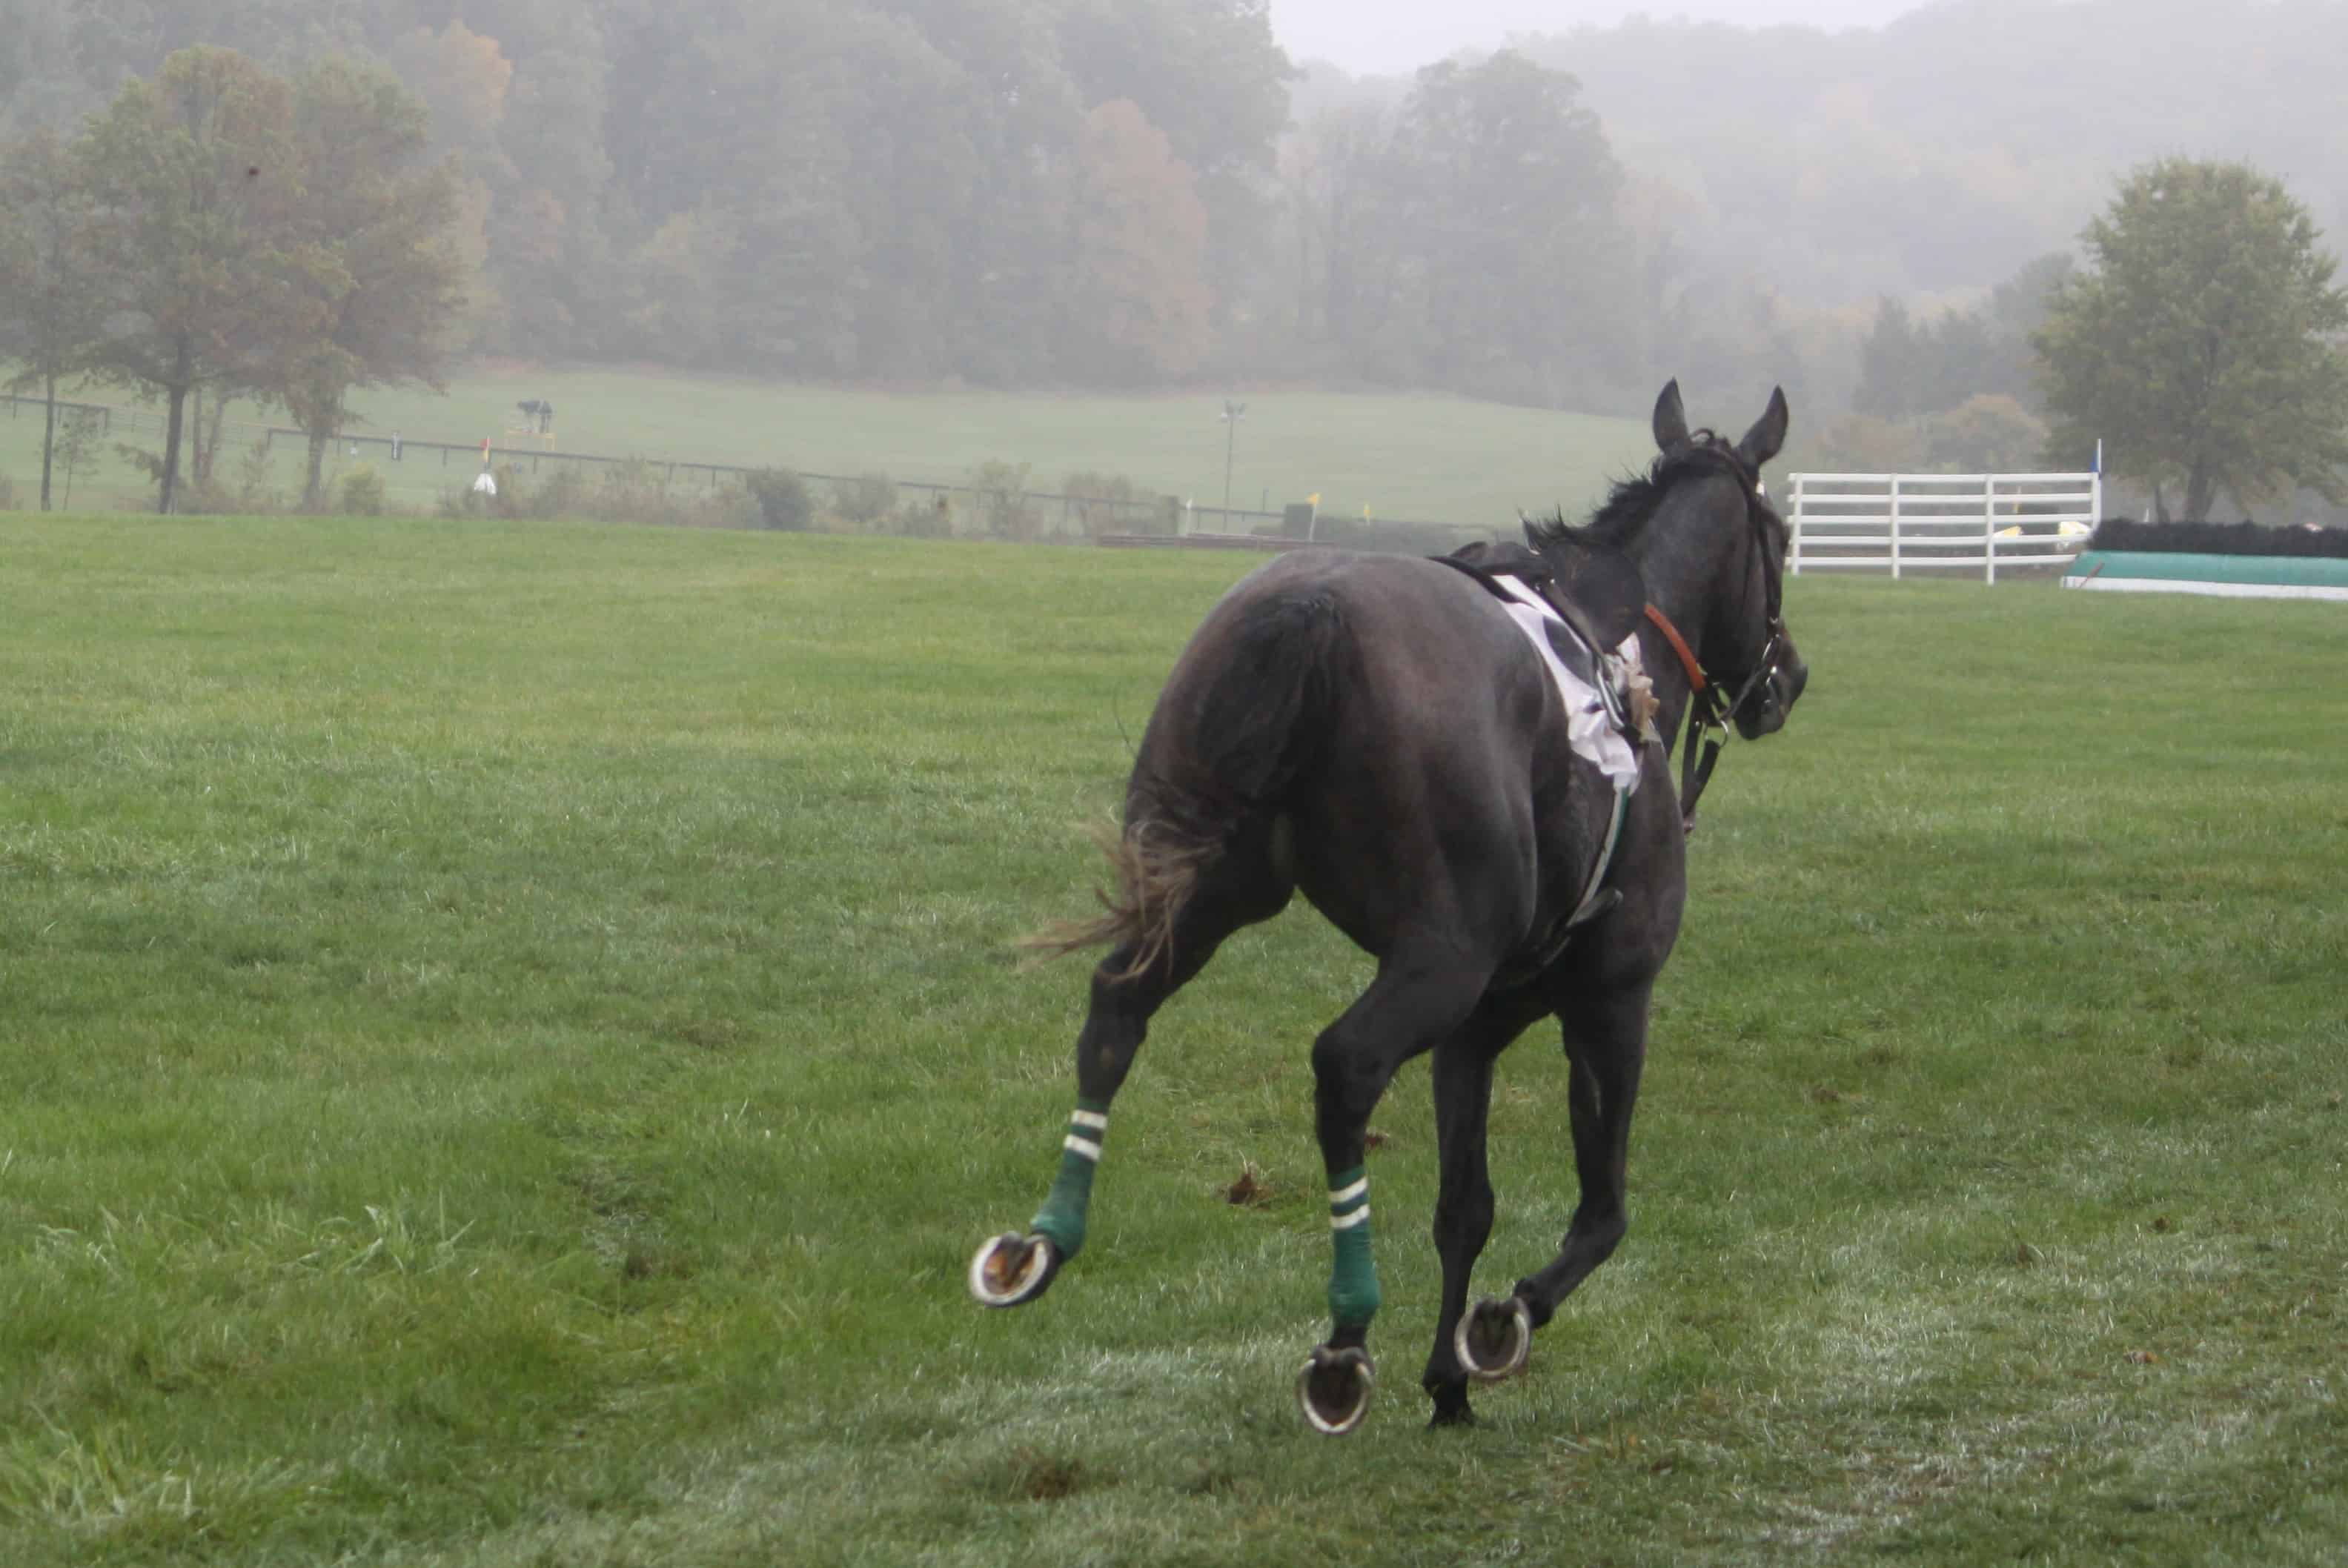 runaway horse